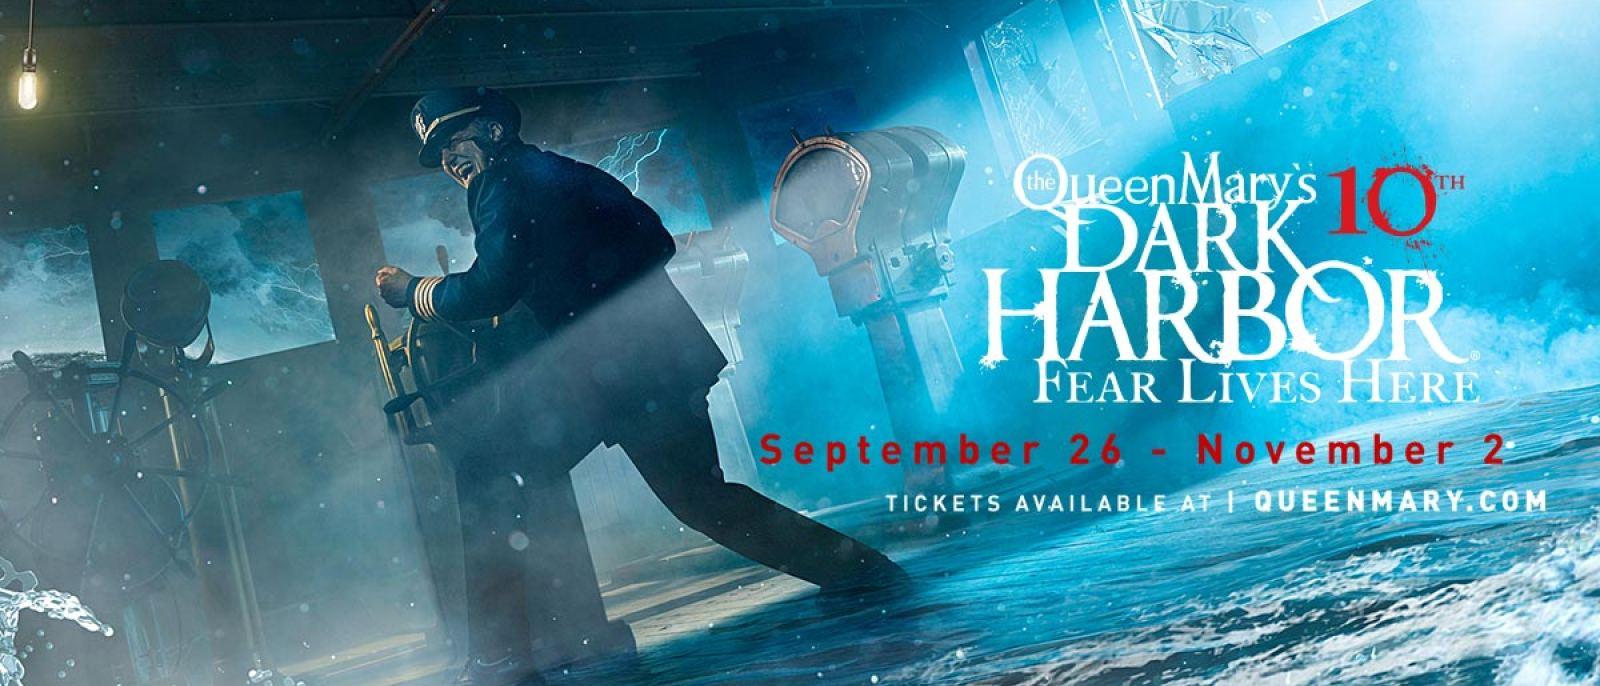 The Captain | Photo: The Queen Mary's Dark Harbor, Facebook